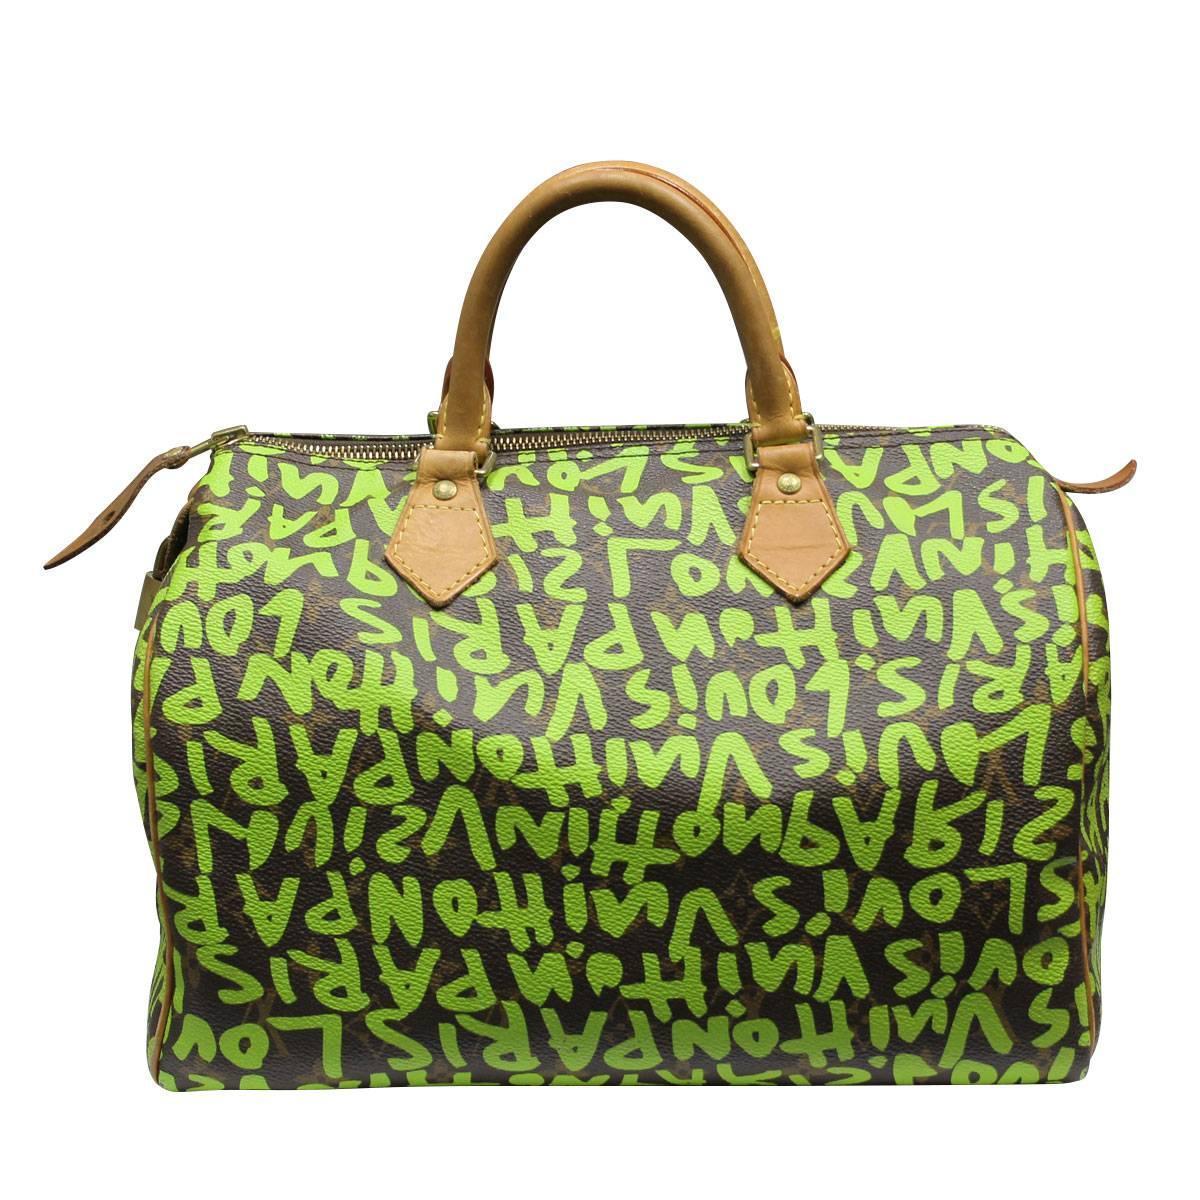 Louis Vuitton Stephen Sprouse Graffiti Replica Confederated